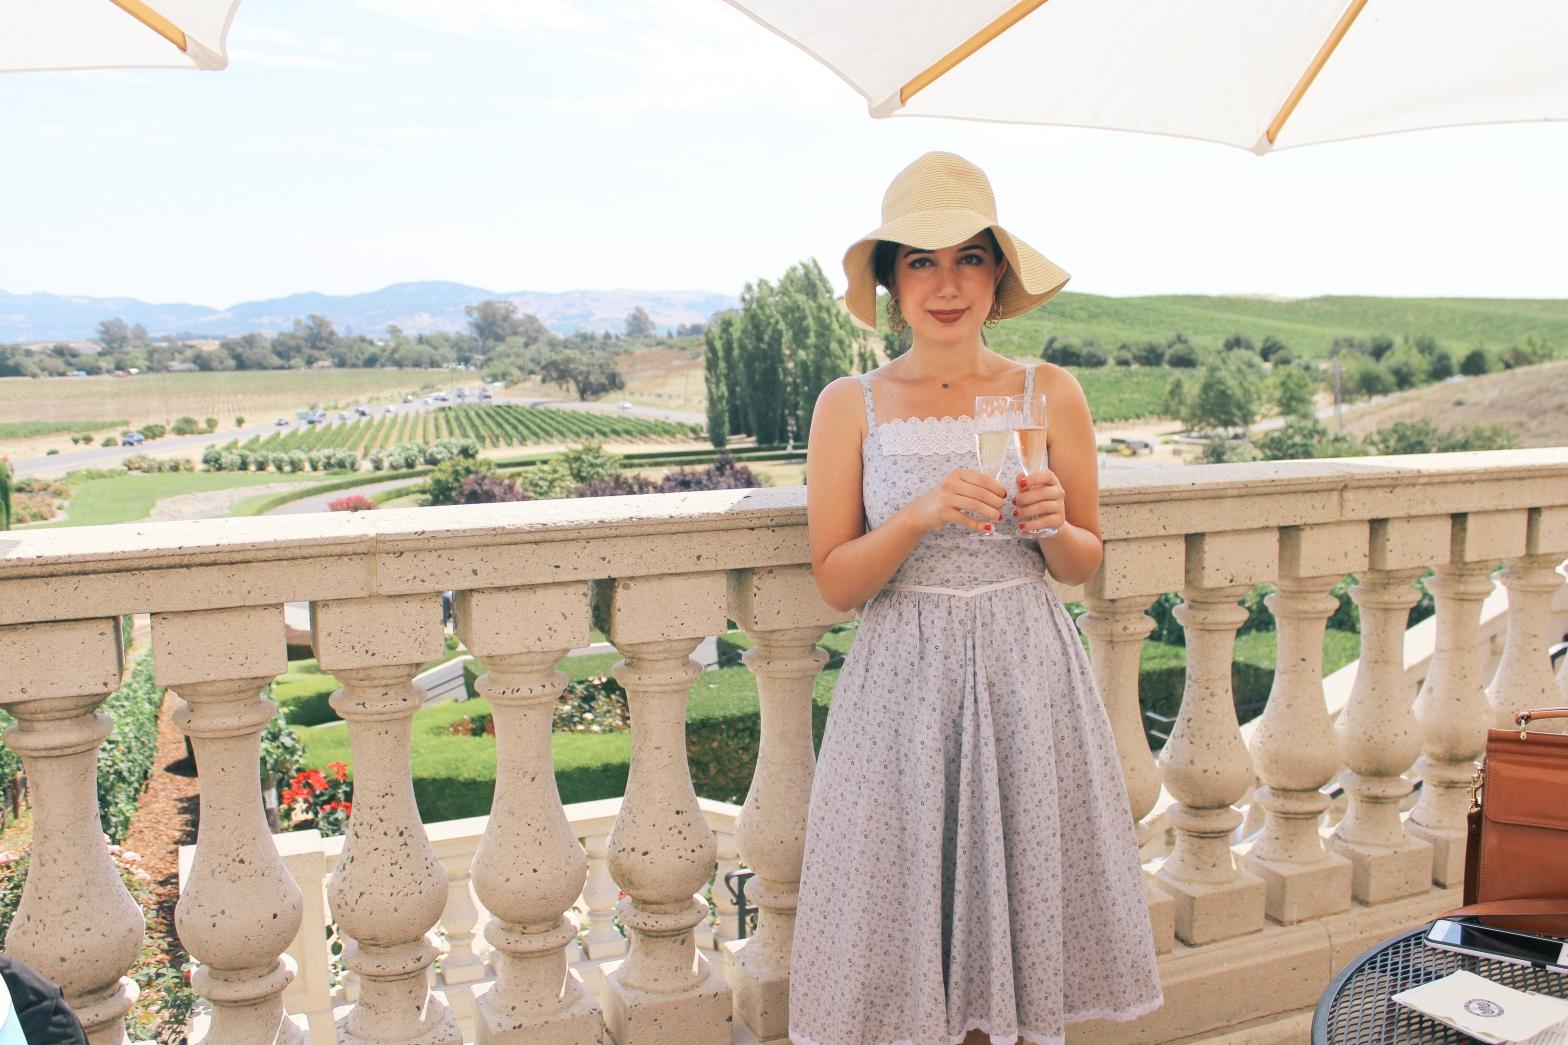 Domaine Carneros Winery, Napa outfit, Napa Valley, landscape photography, sundress, ootd, vintage dress, floppy hat, embellished flats, summer style